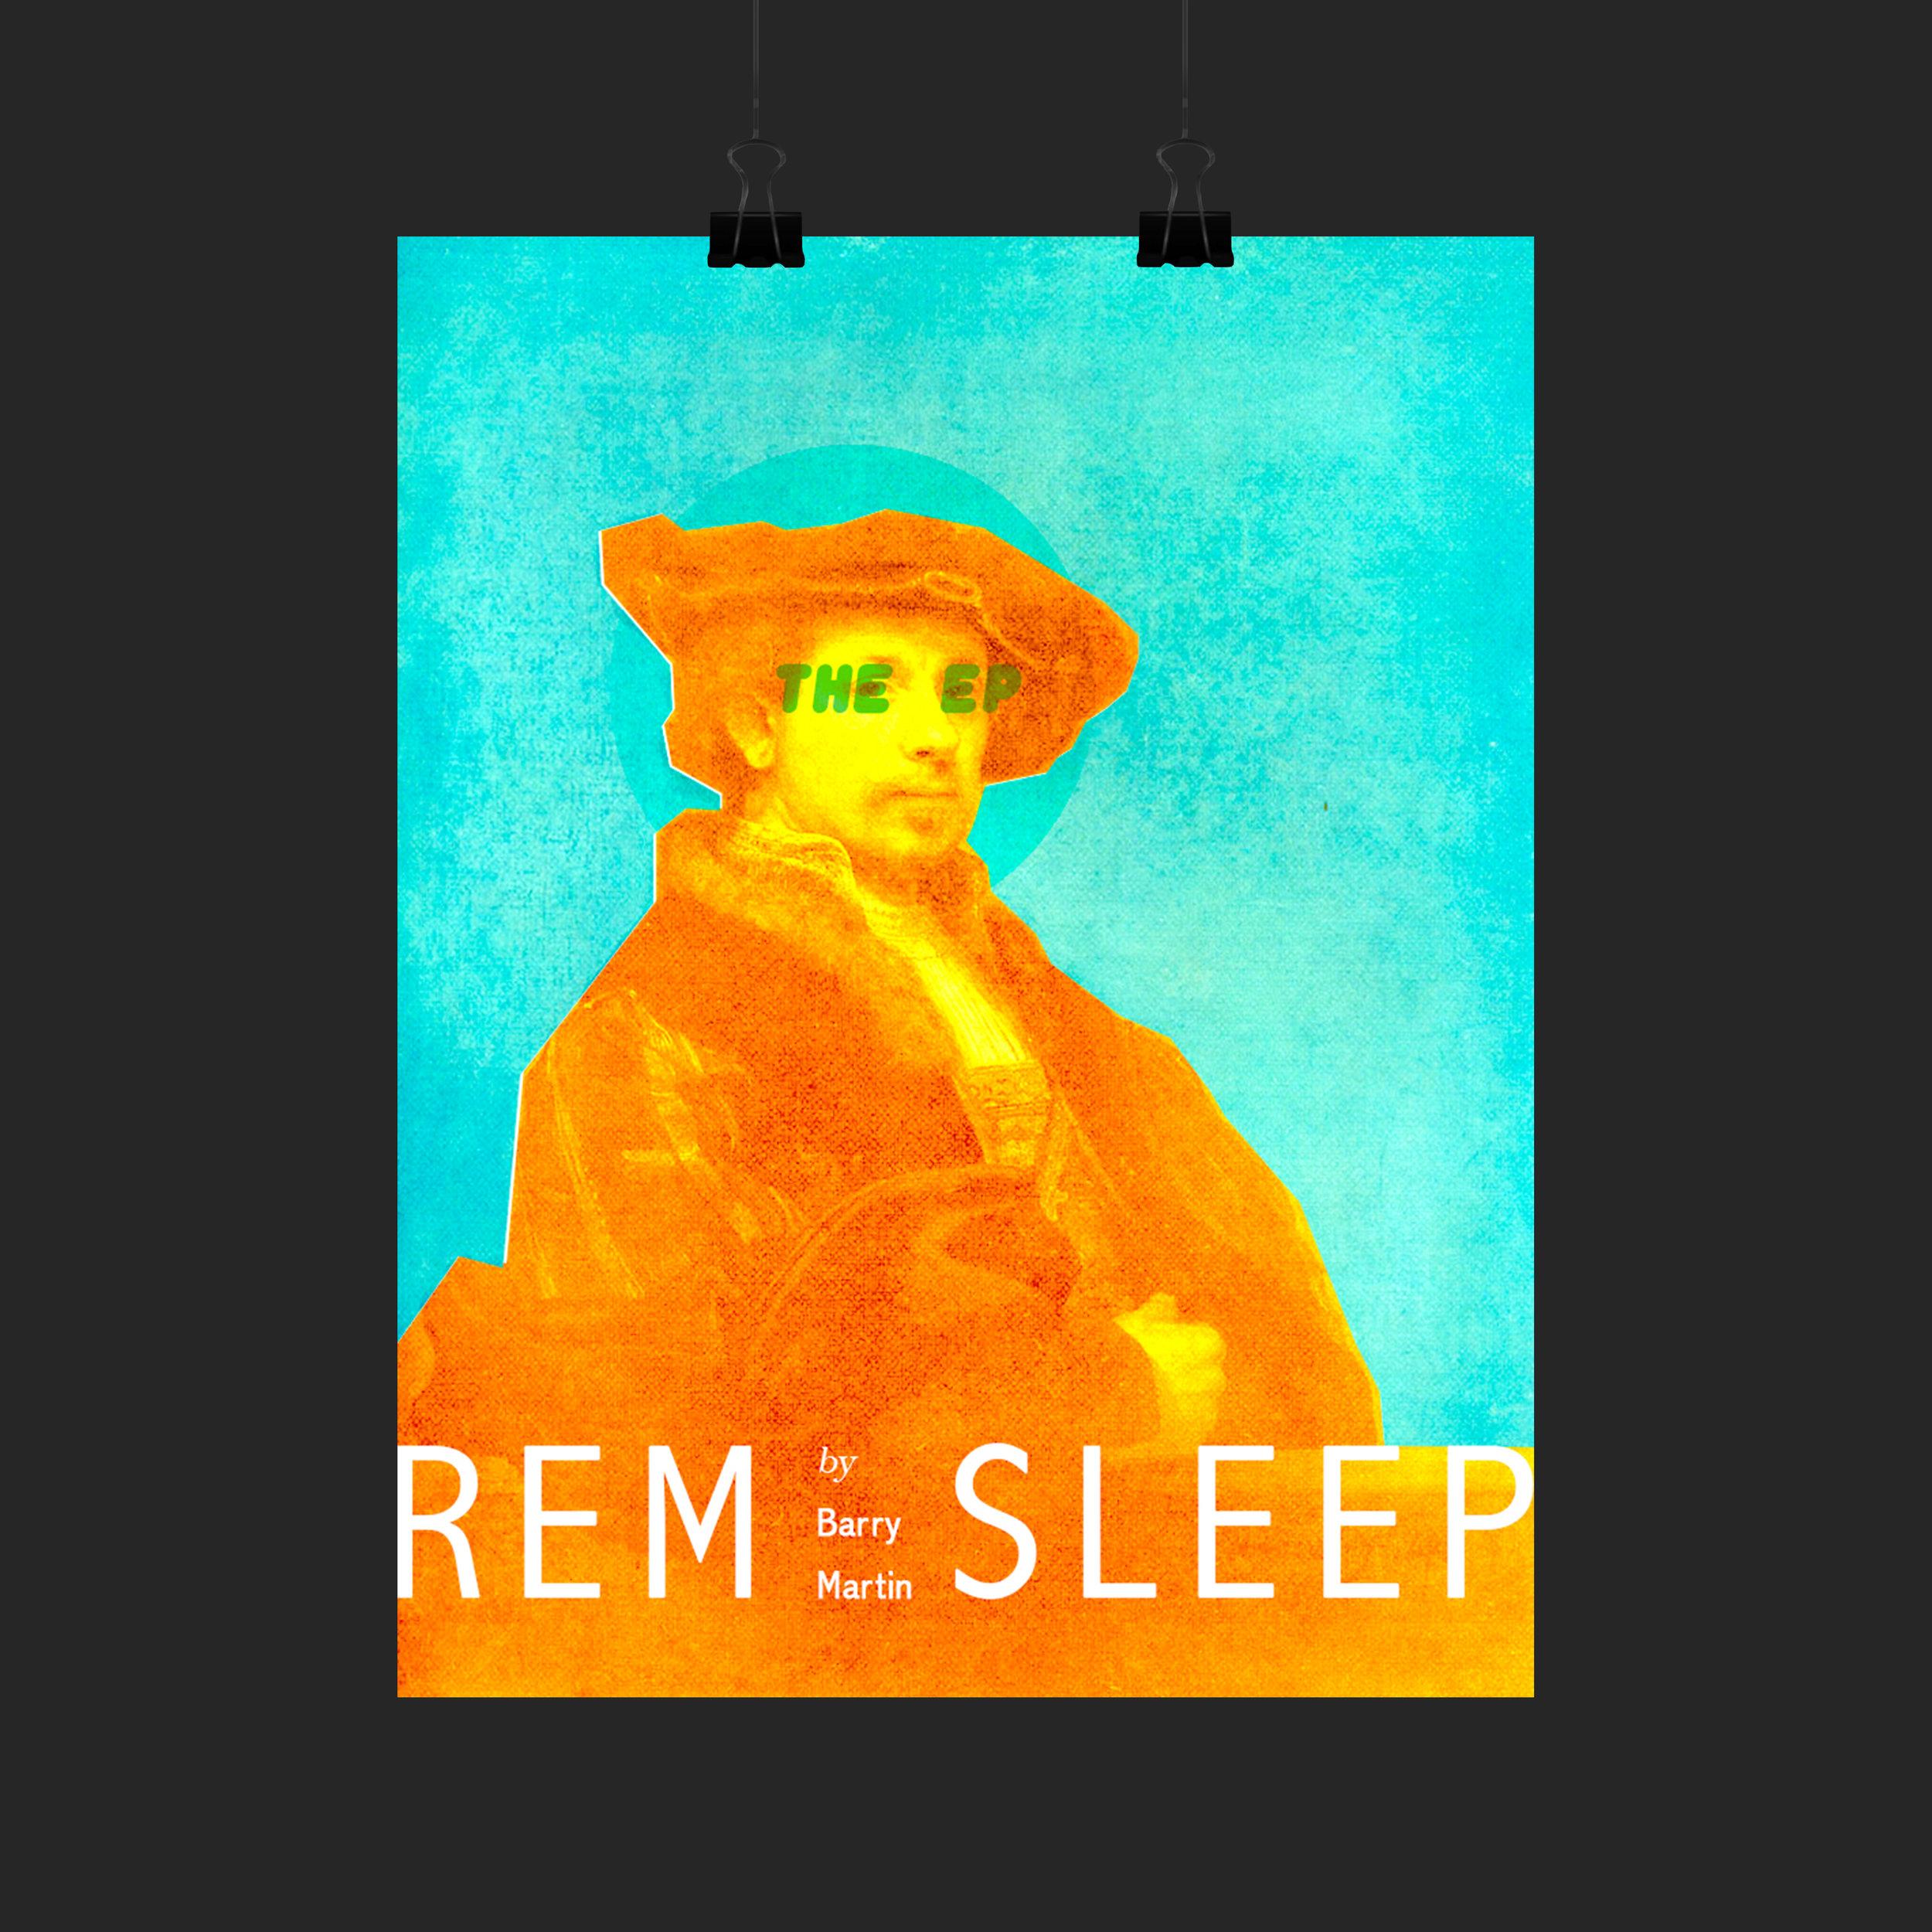 rem sleep poster mockup.jpg